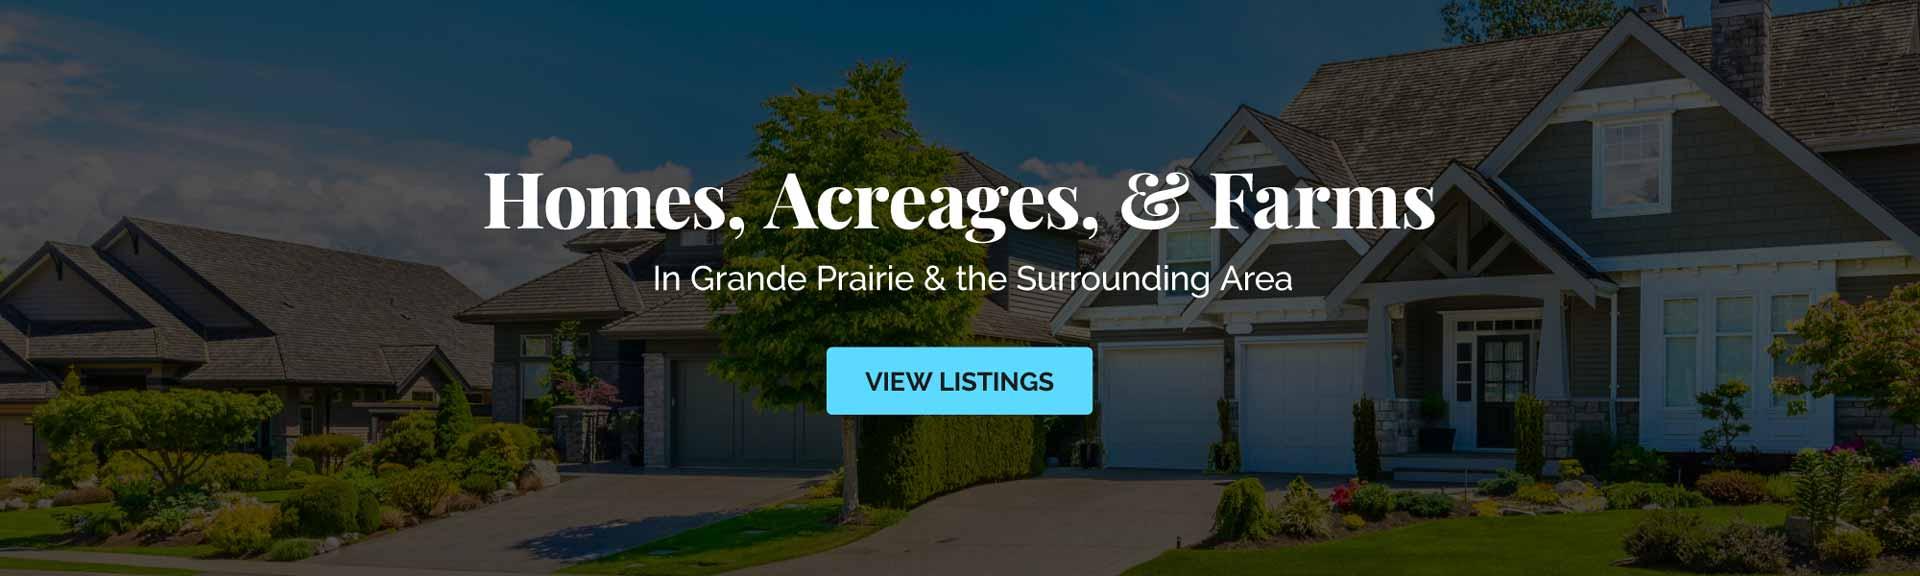 Homes, Acreages, & Farms